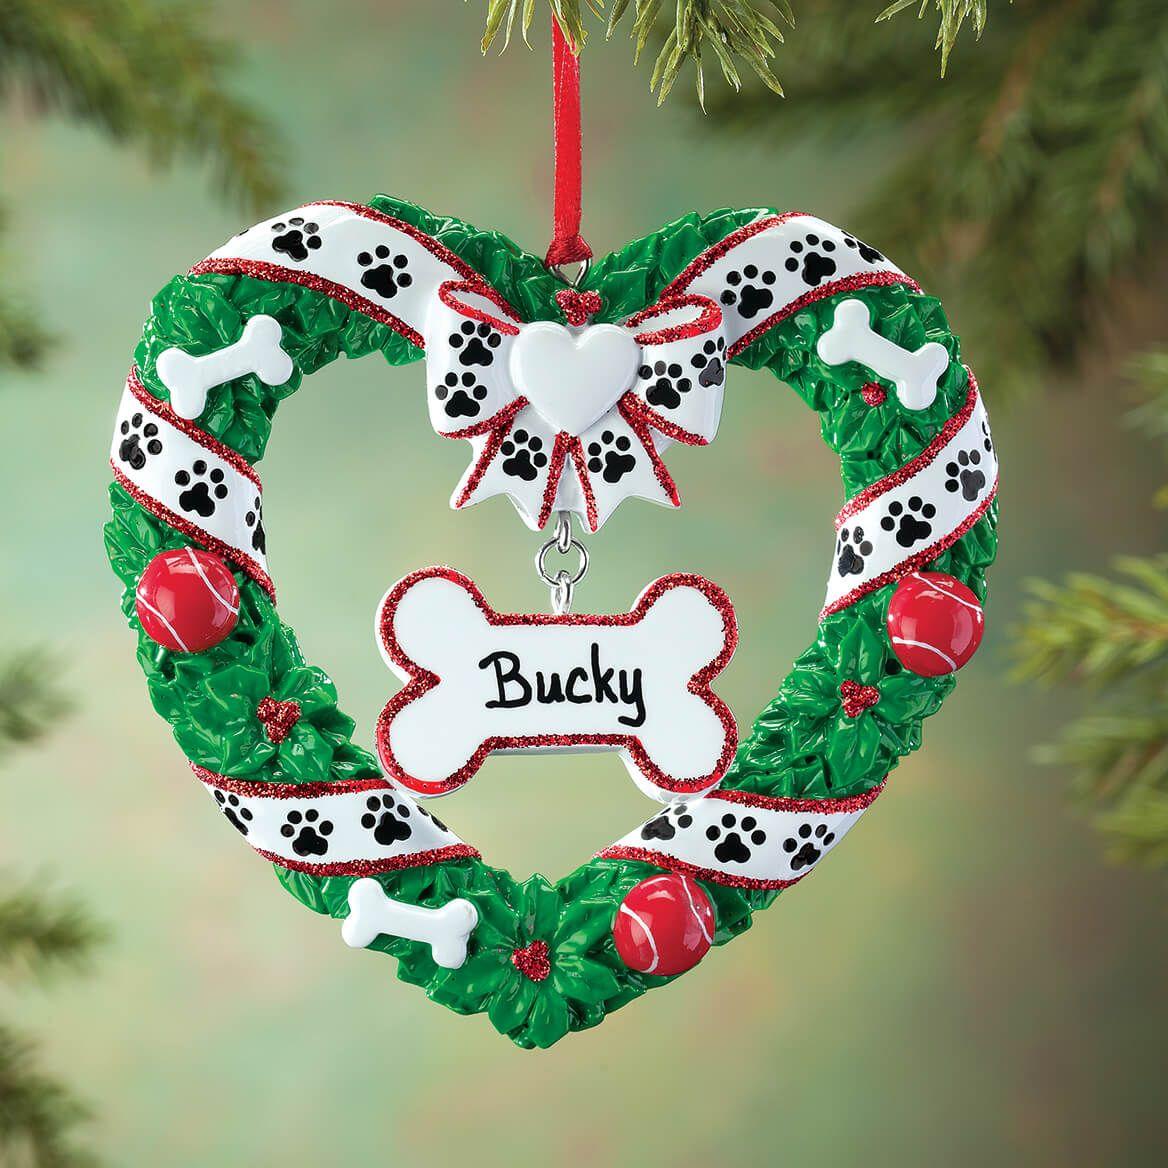 Personalized Pet Wreath Ornament-364878